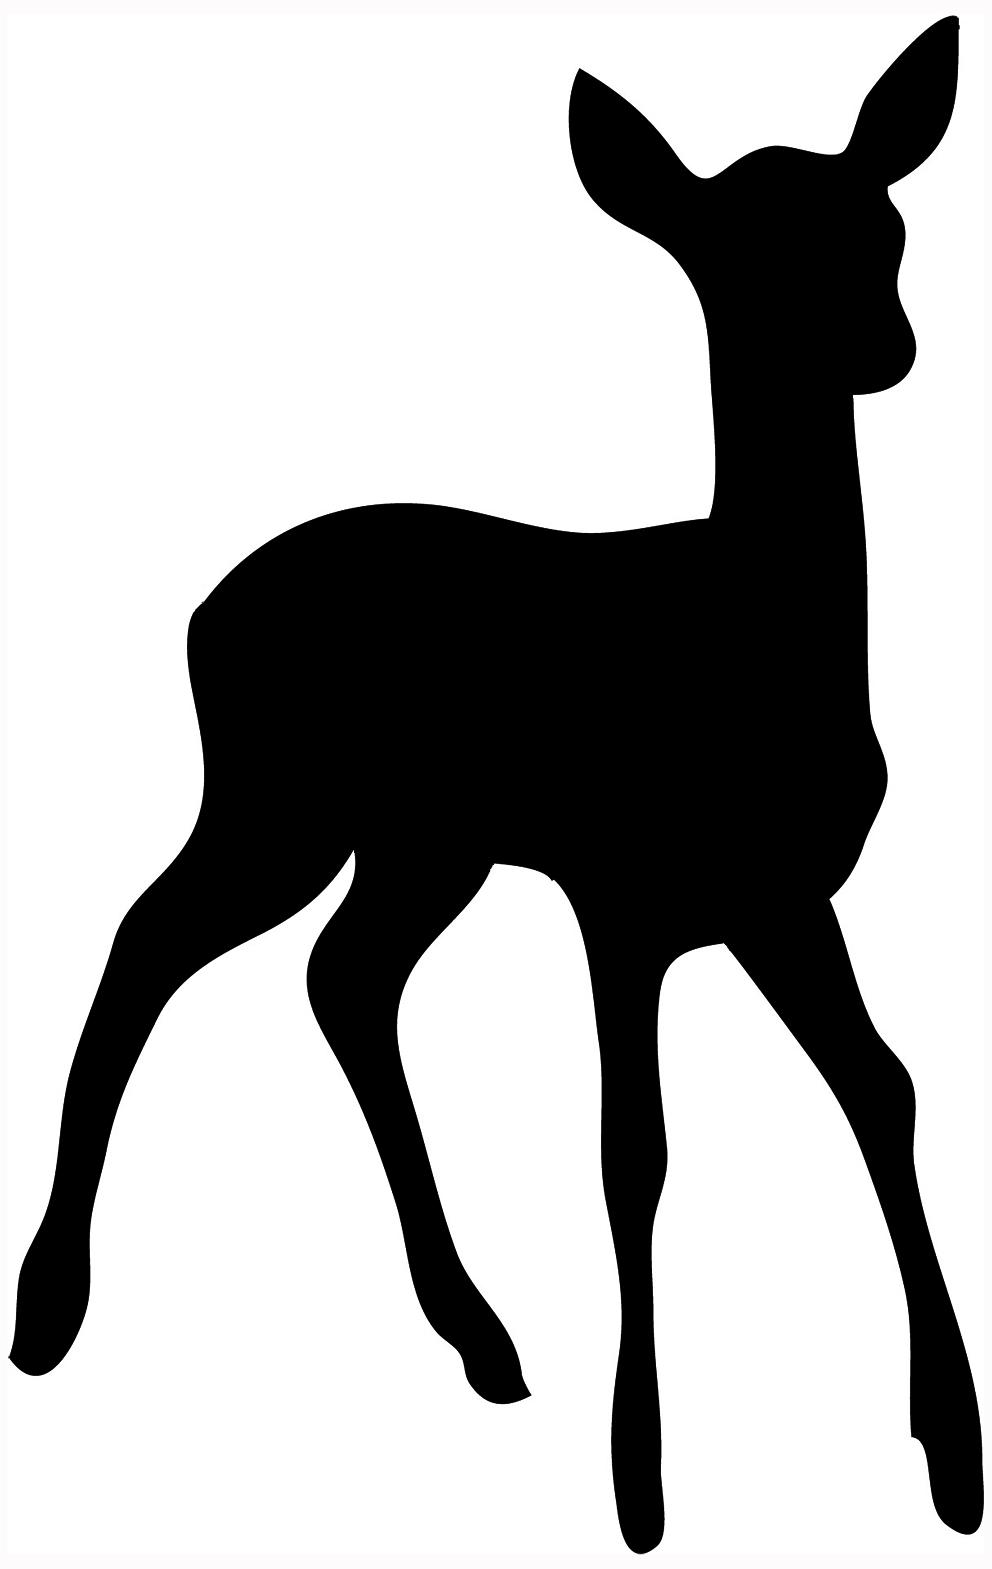 Wildlife clipart silhouette Cutouts Silhouette Art Animal Art